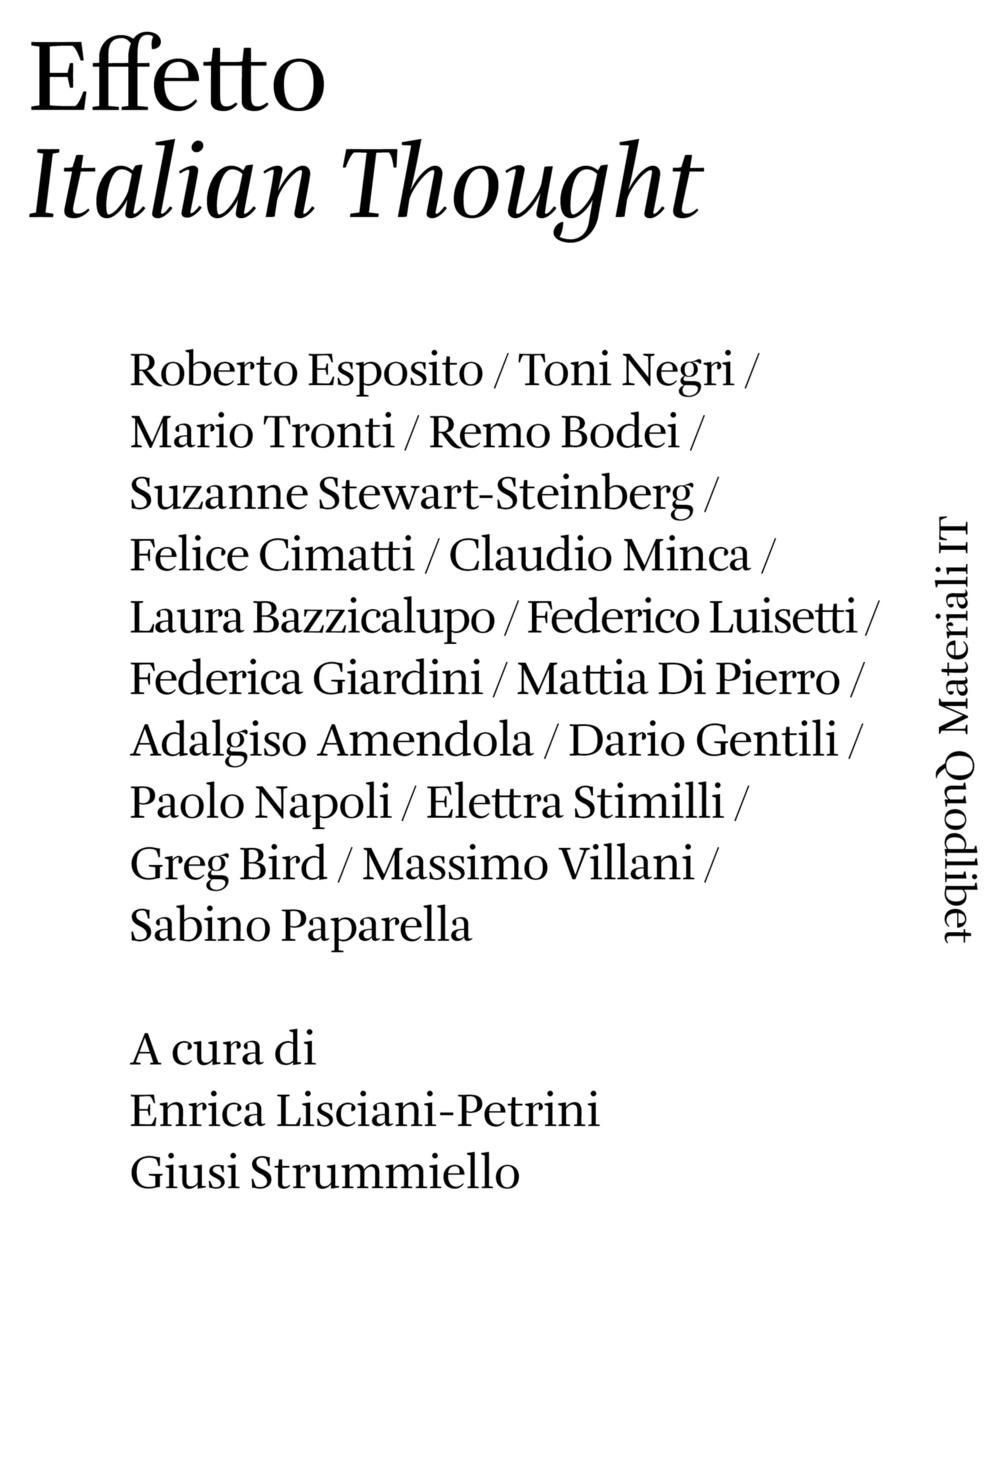 EFFETTO «ITALIAN THOUGHT» - 9788822901118